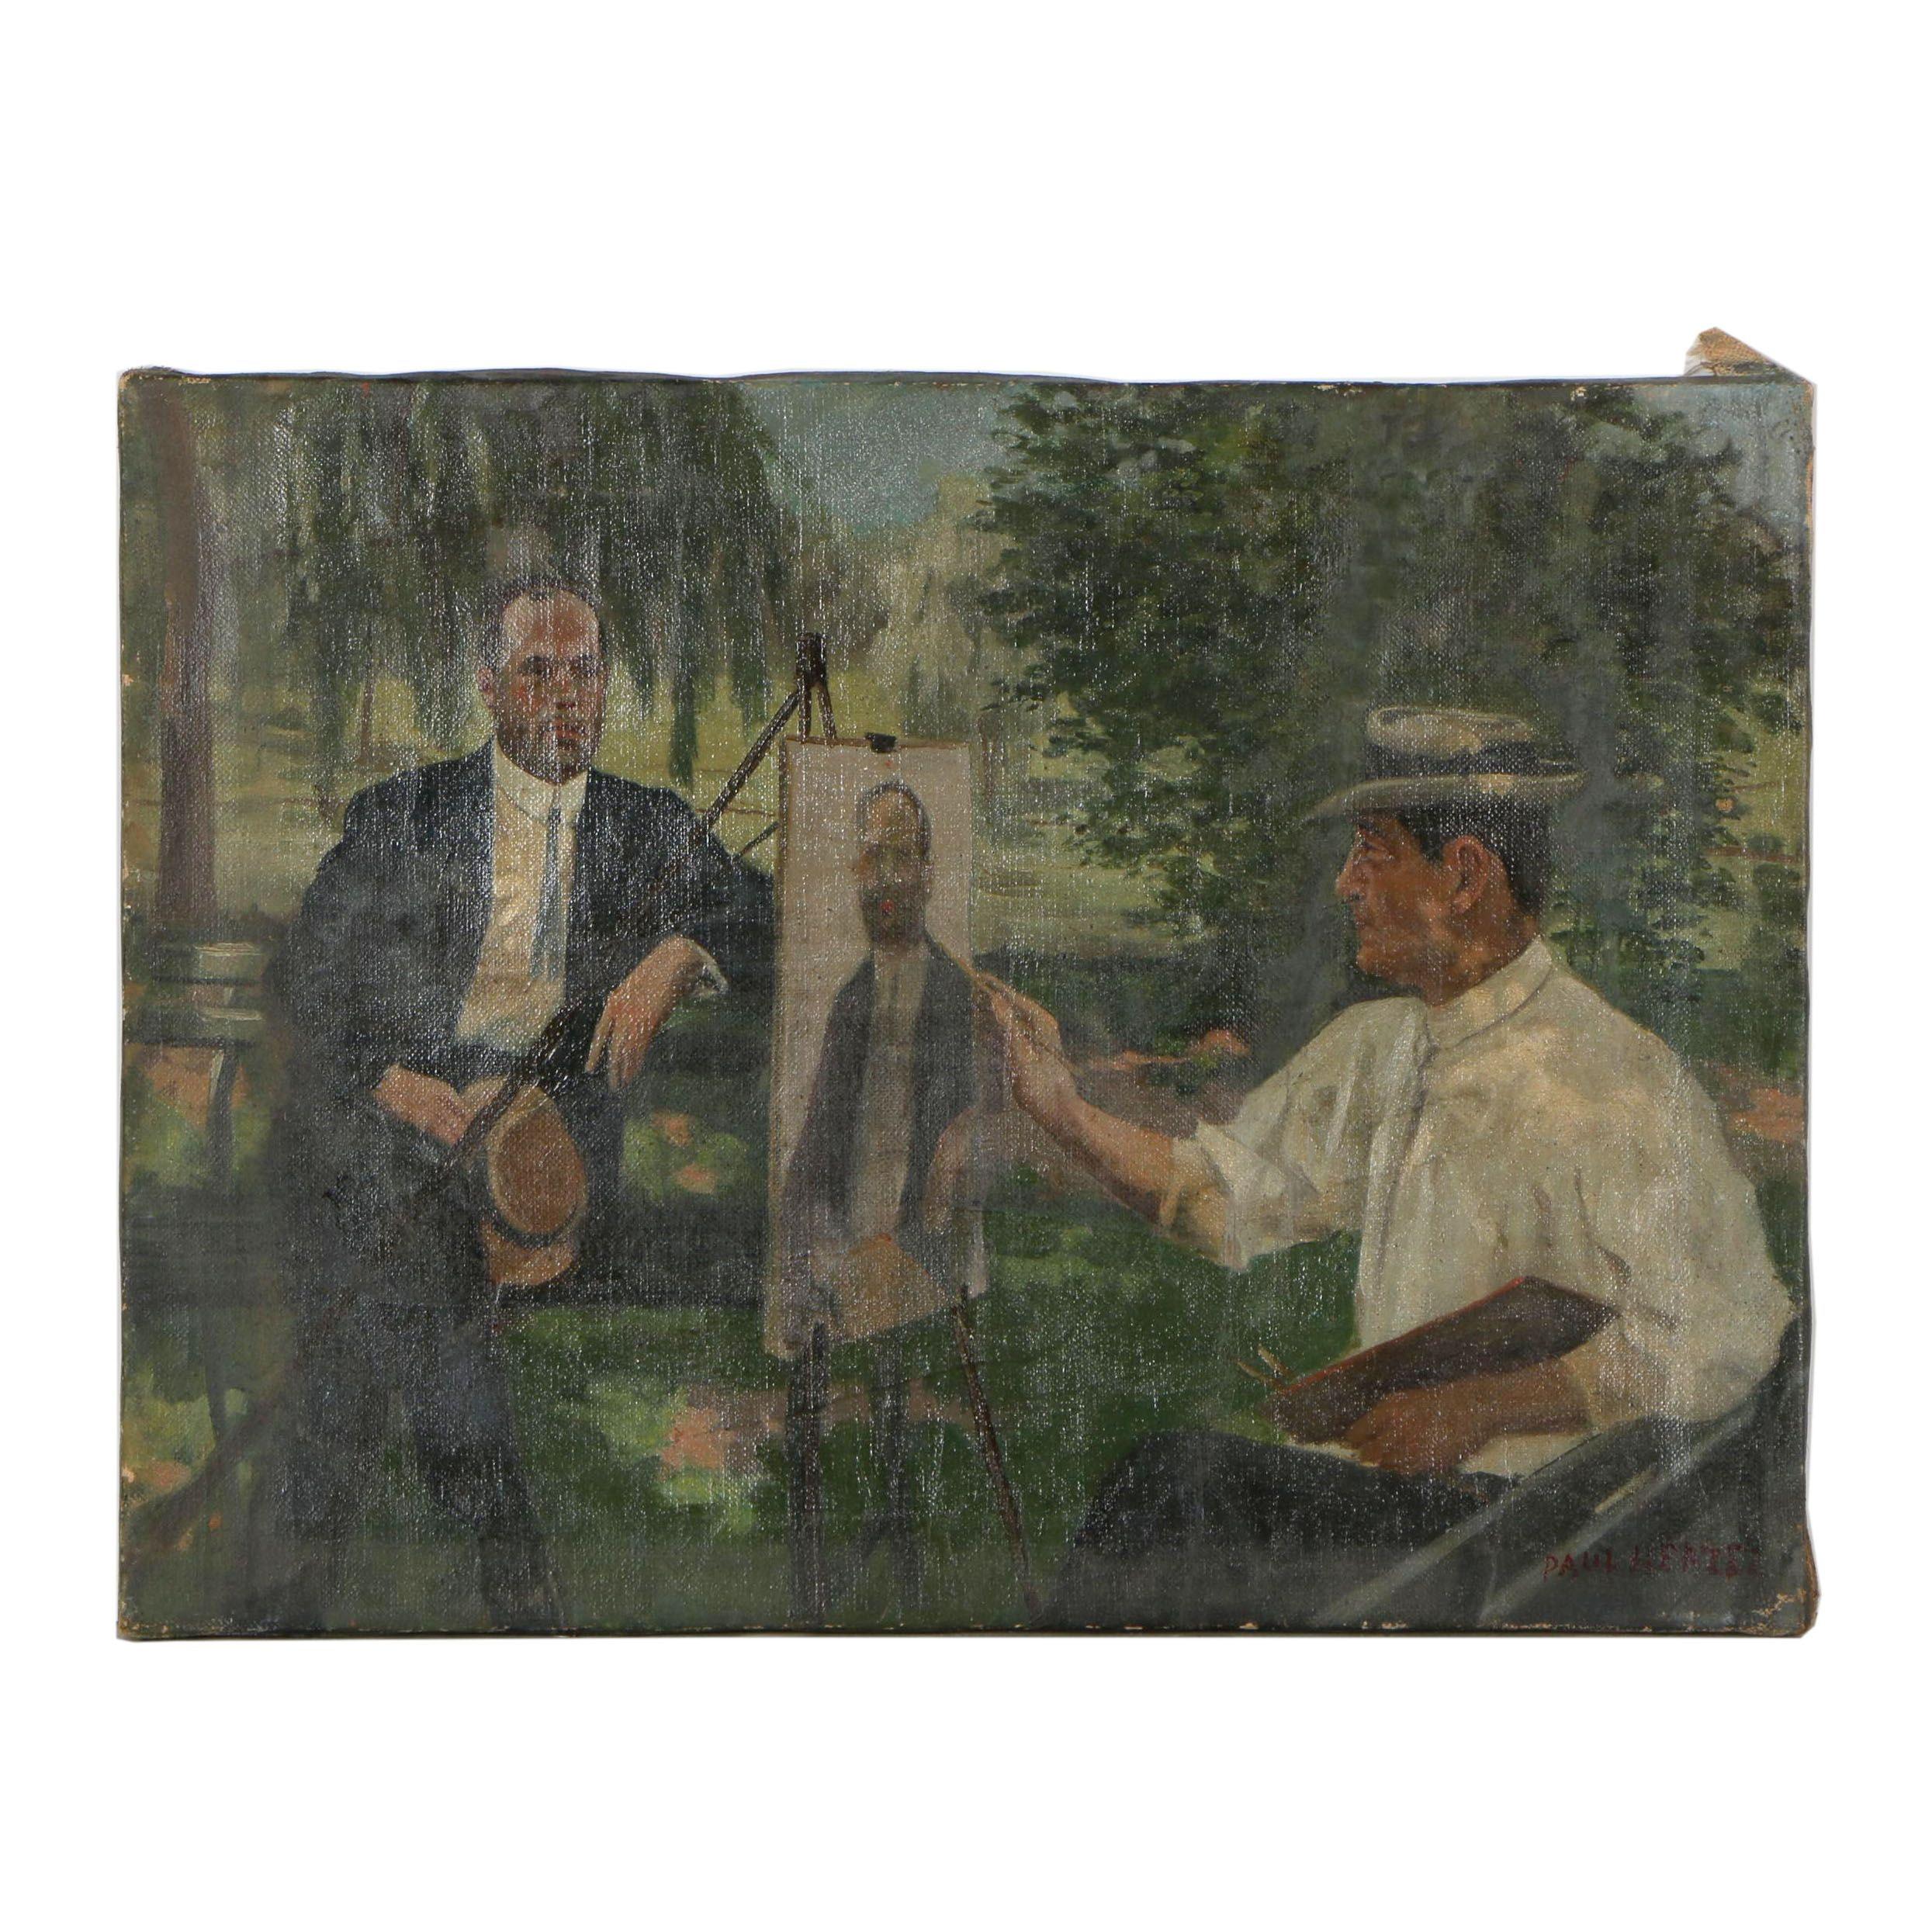 Paul Herzel Portrait Oil Painting of Artist and Sitter